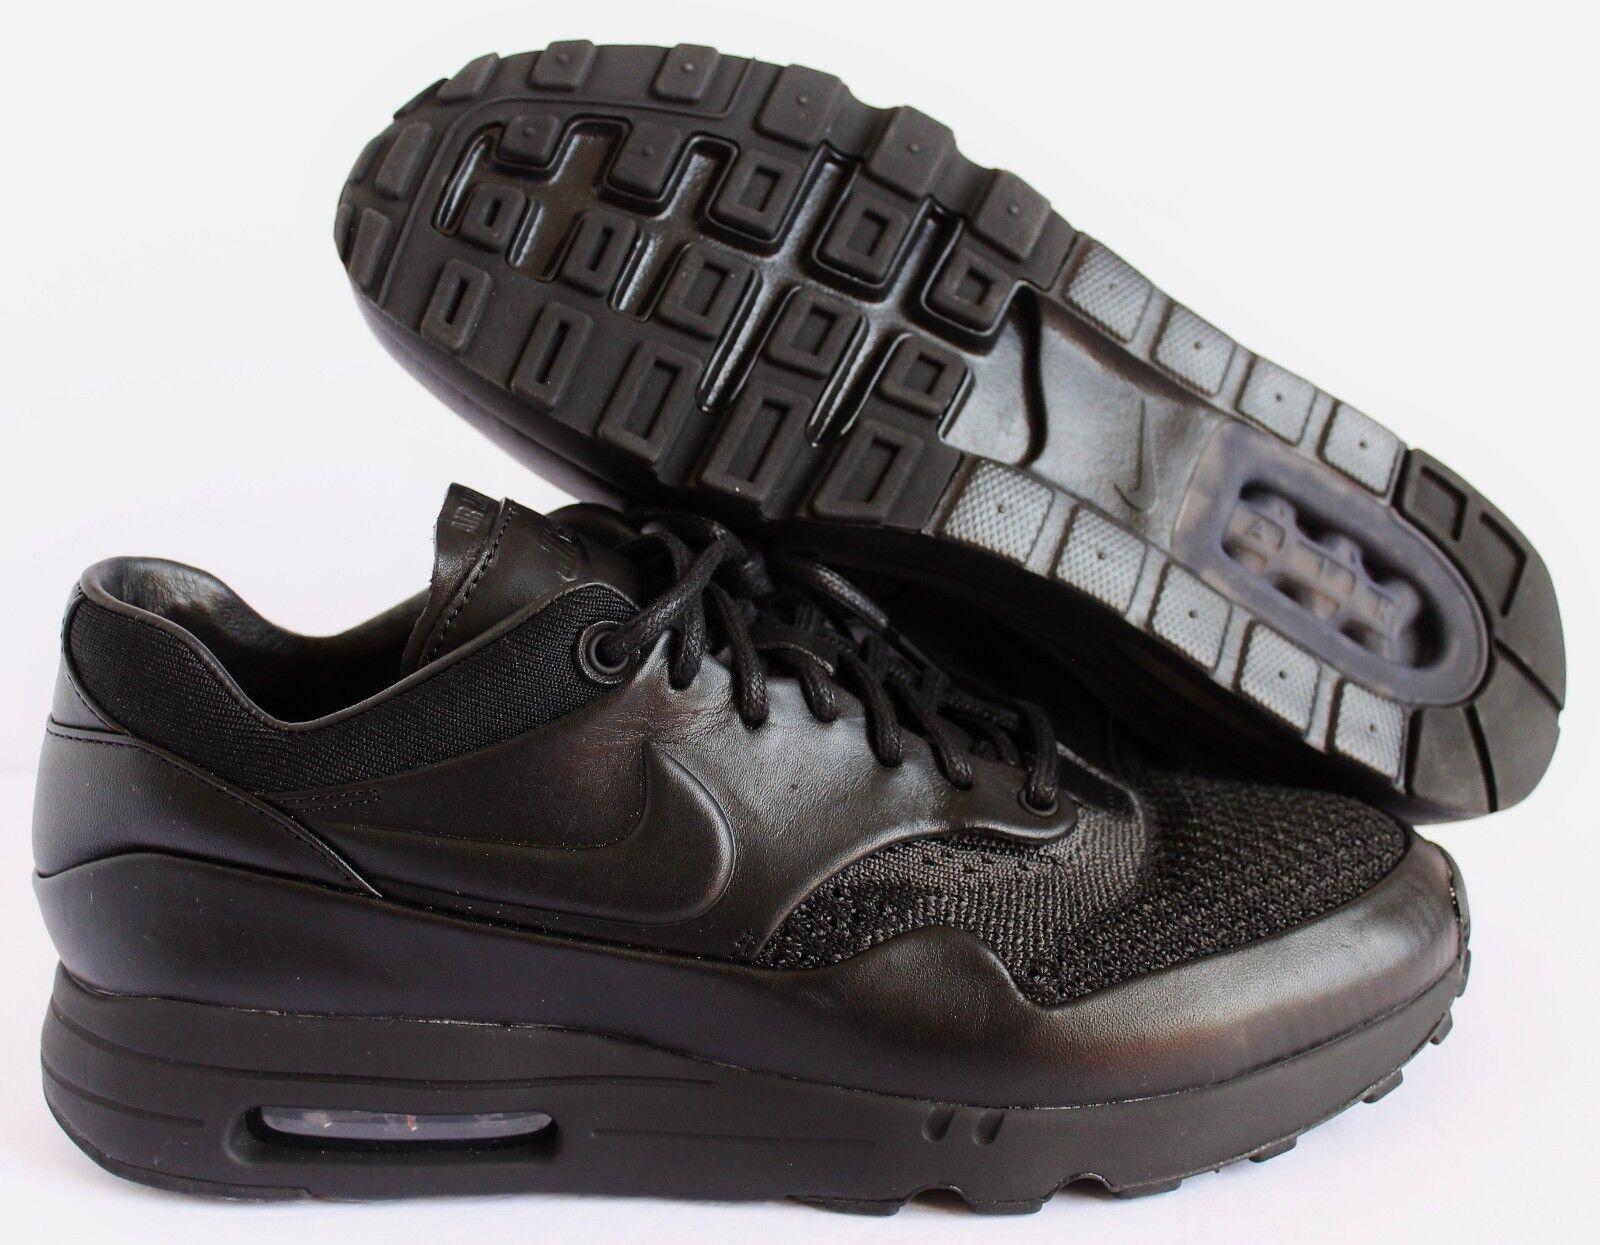 Nike air jordan retrò 7 15 029 marvin il marziano vii og raptor 304775 029 15 j2k allevati 7ad33c